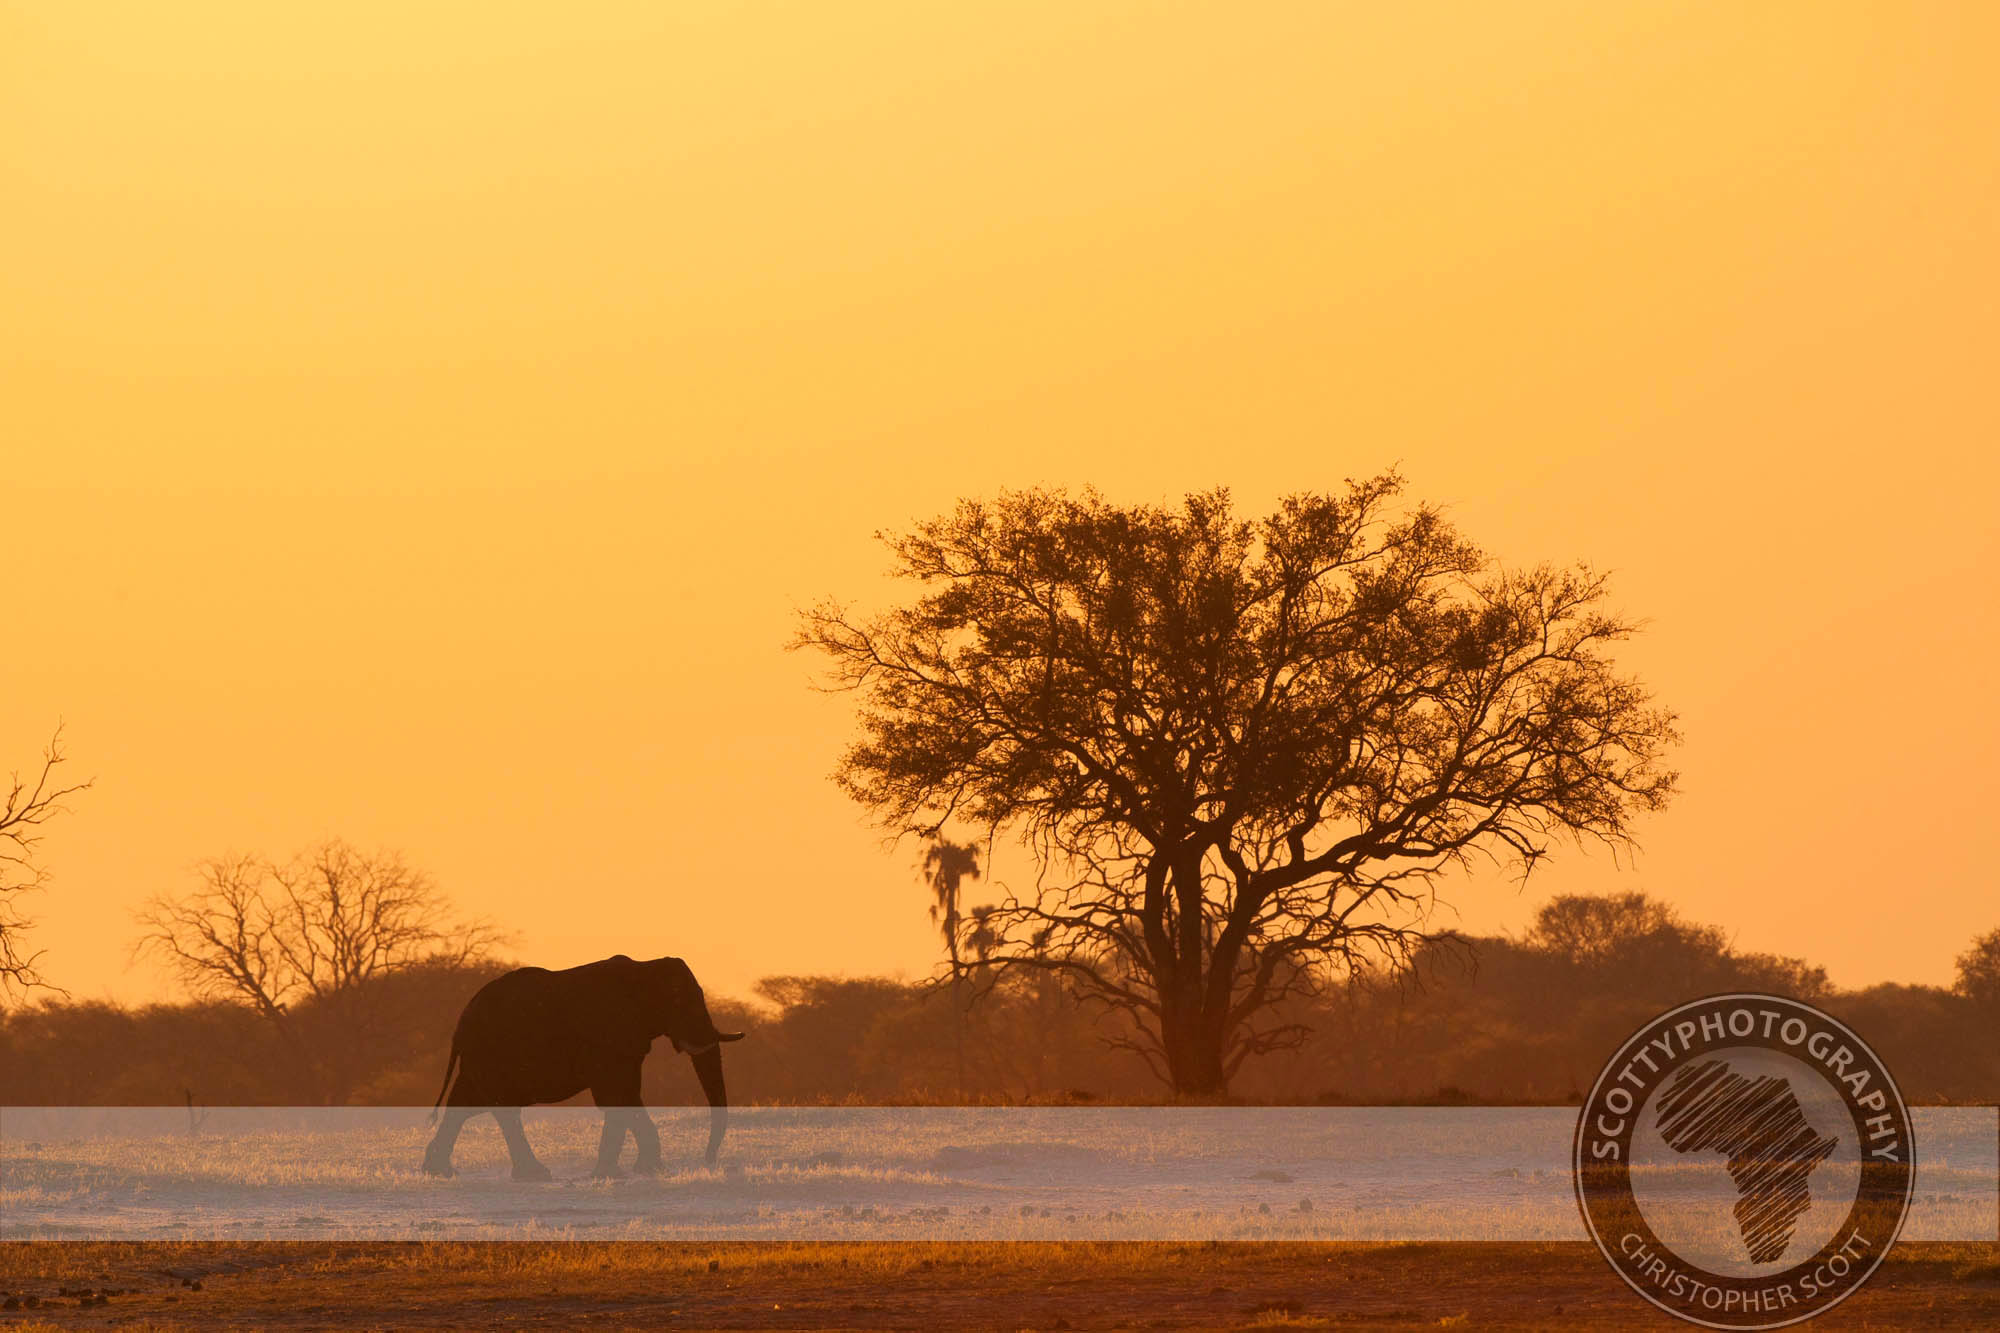 Elephant-4016-2.jpg